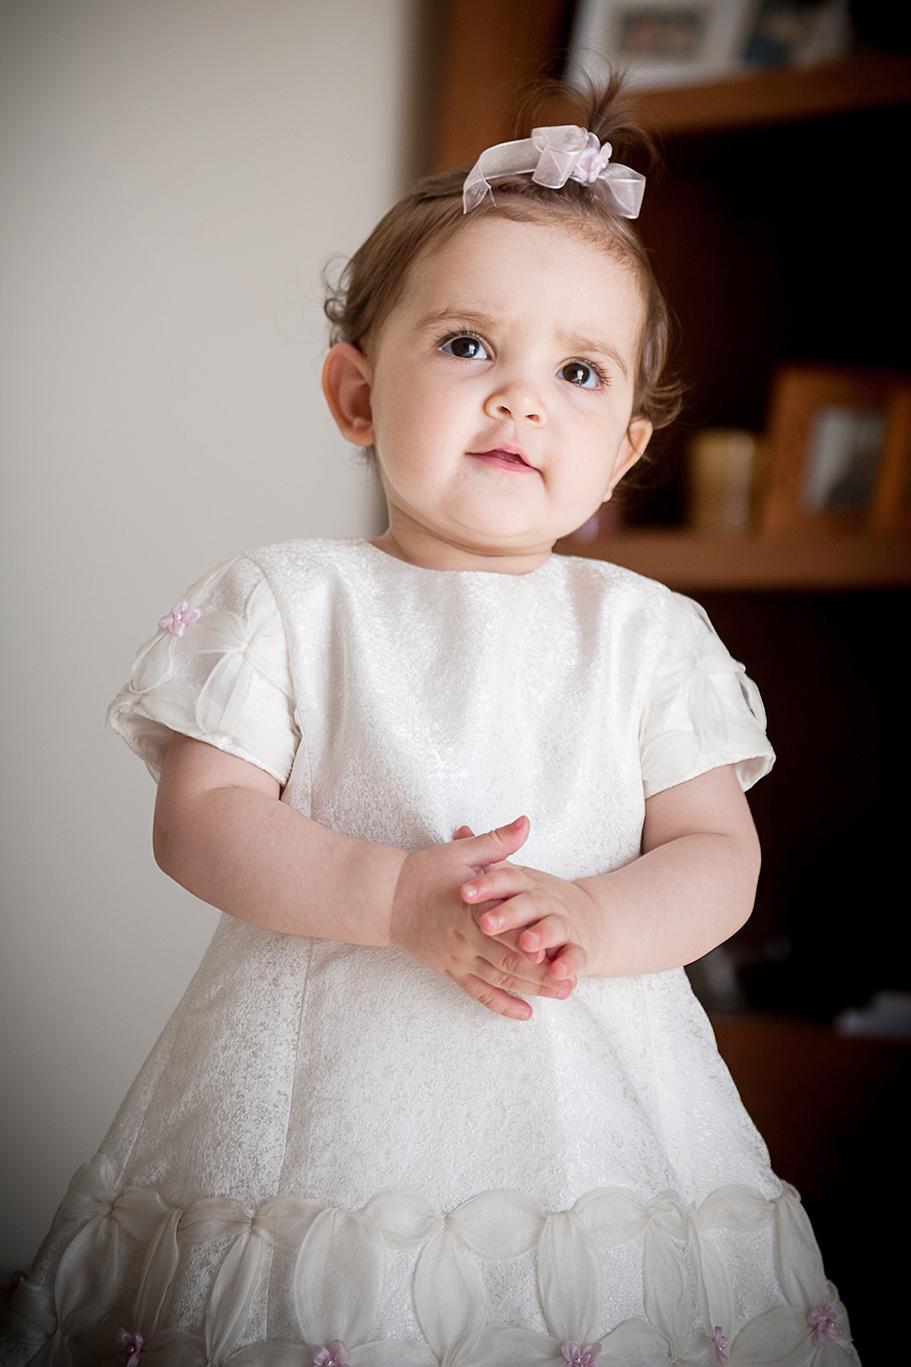 Maria-baptizado-2.jpg